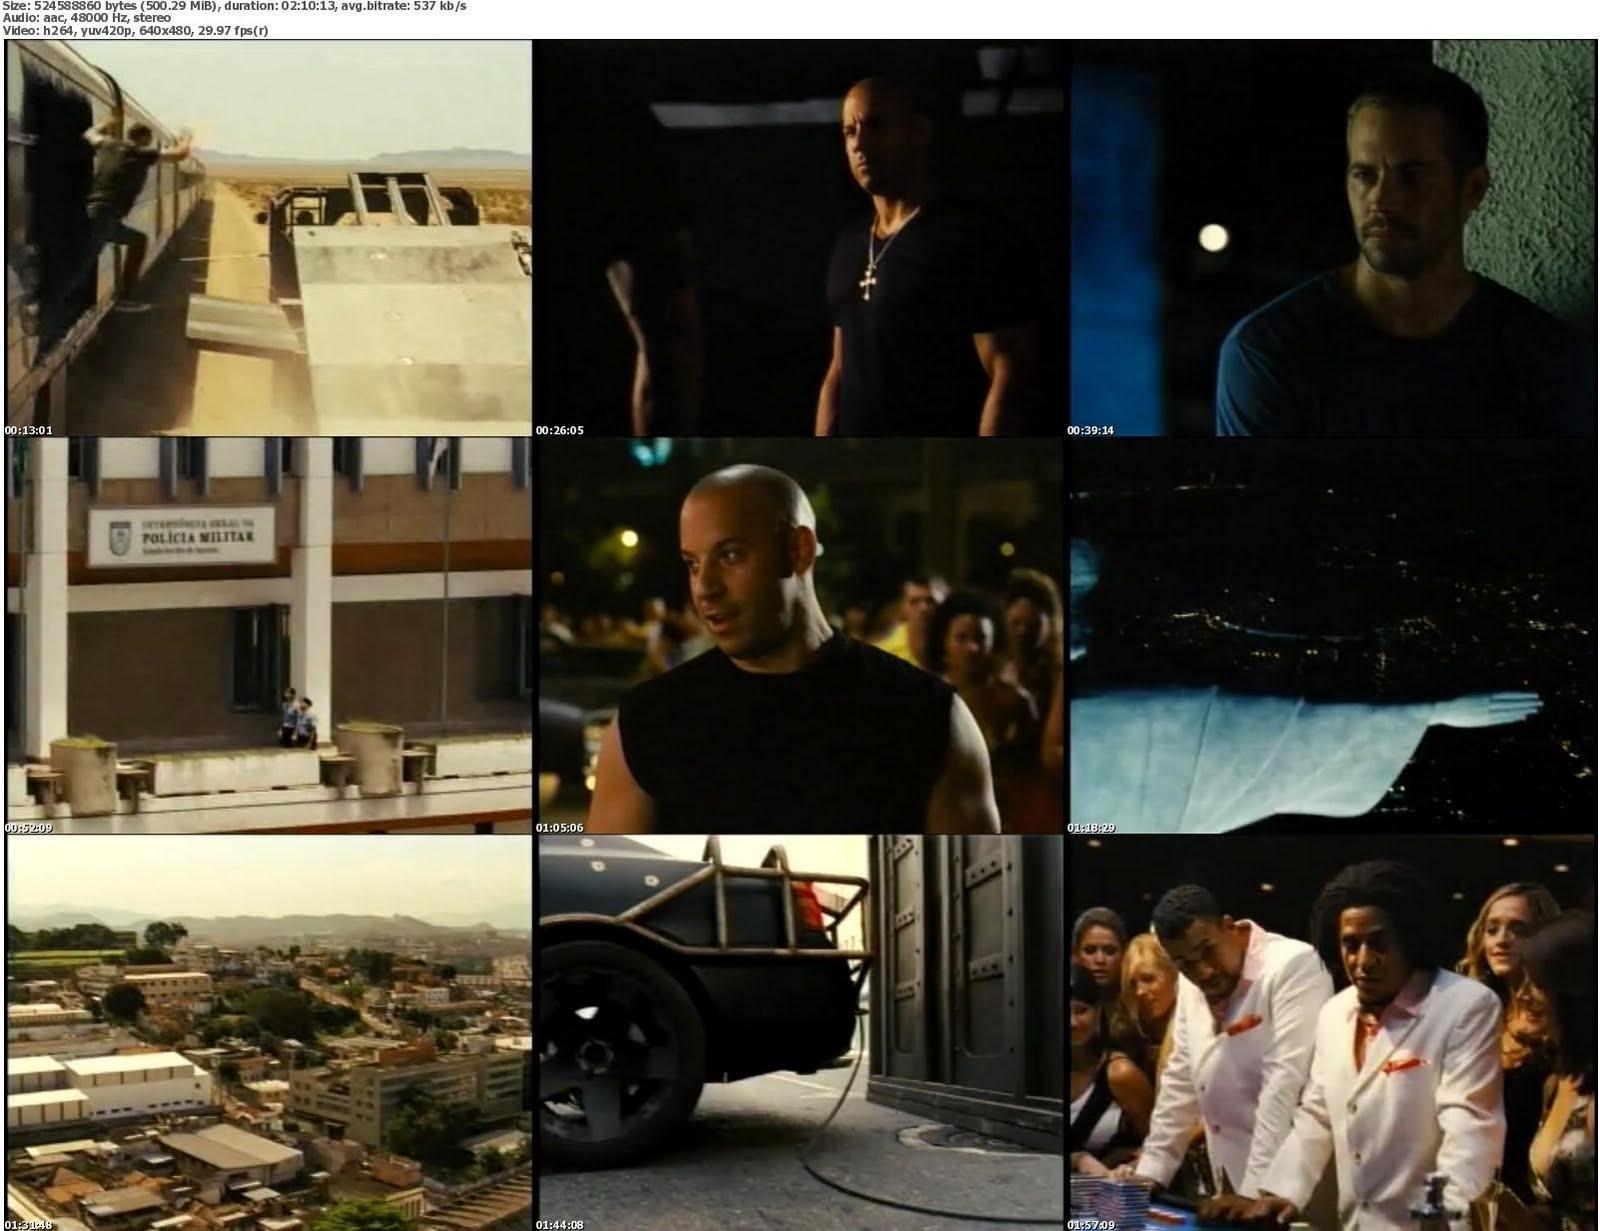 http://4.bp.blogspot.com/-WPOSRc8CxIk/The1TYQYhTI/AAAAAAAABS8/sLGpRRBITfw/s1600/Fast+And+Furious+5+Rio+Heist+%25282011%2529+PPVRip+500MB+mediafirehbo.com.jpg